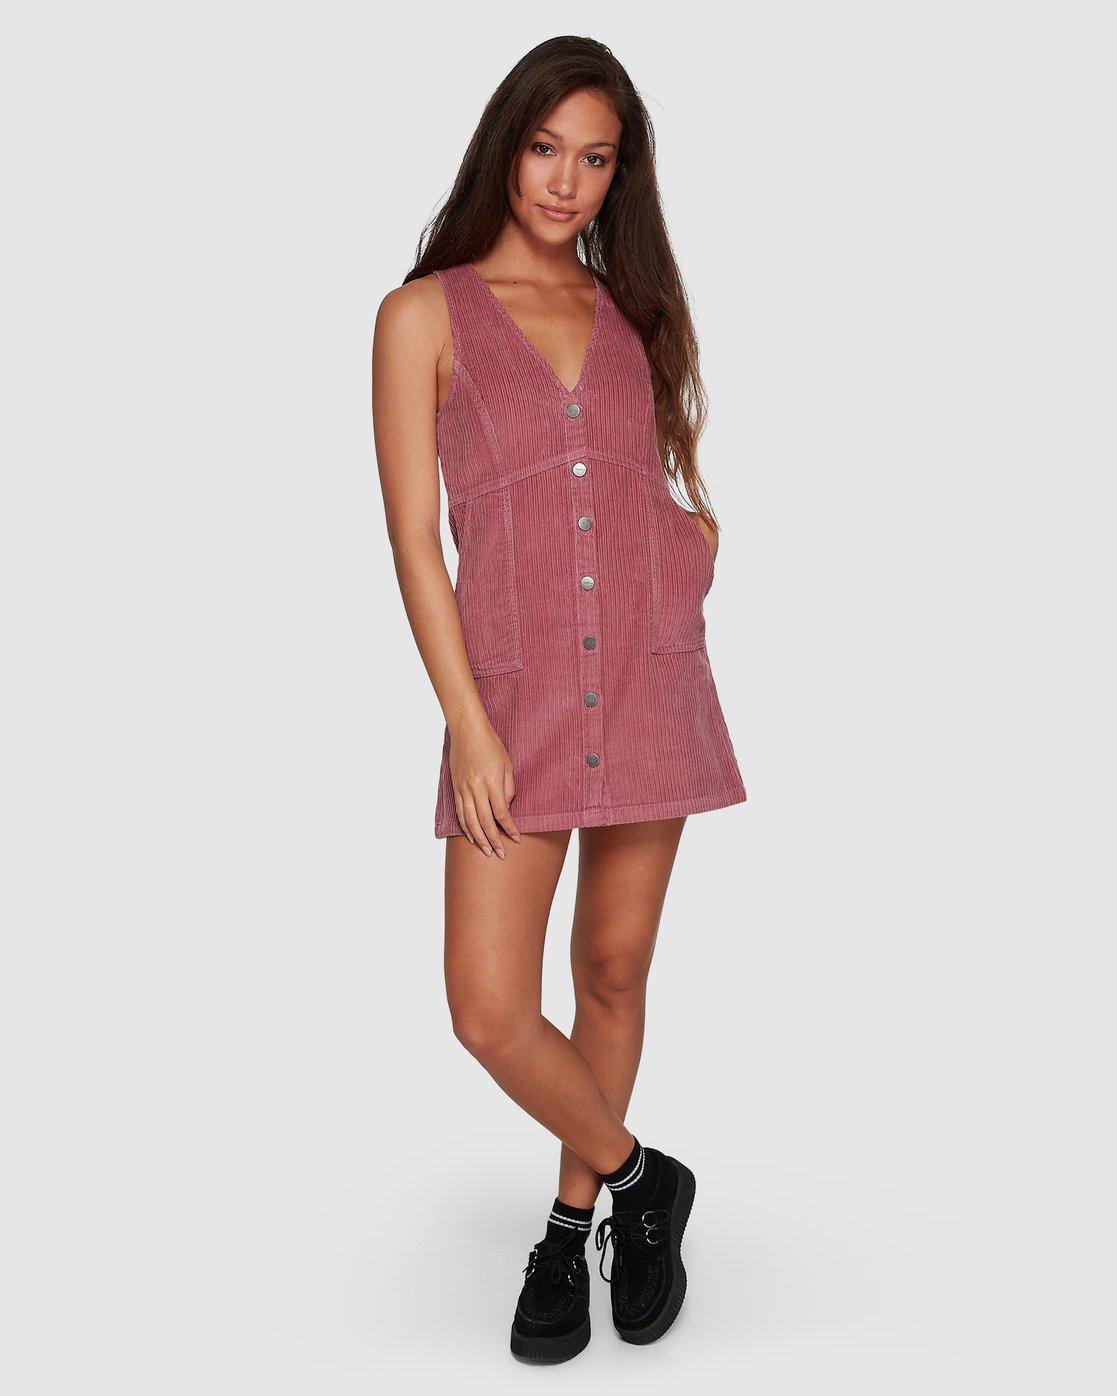 5 Plush Faithless Dress Purple R207760 RVCA